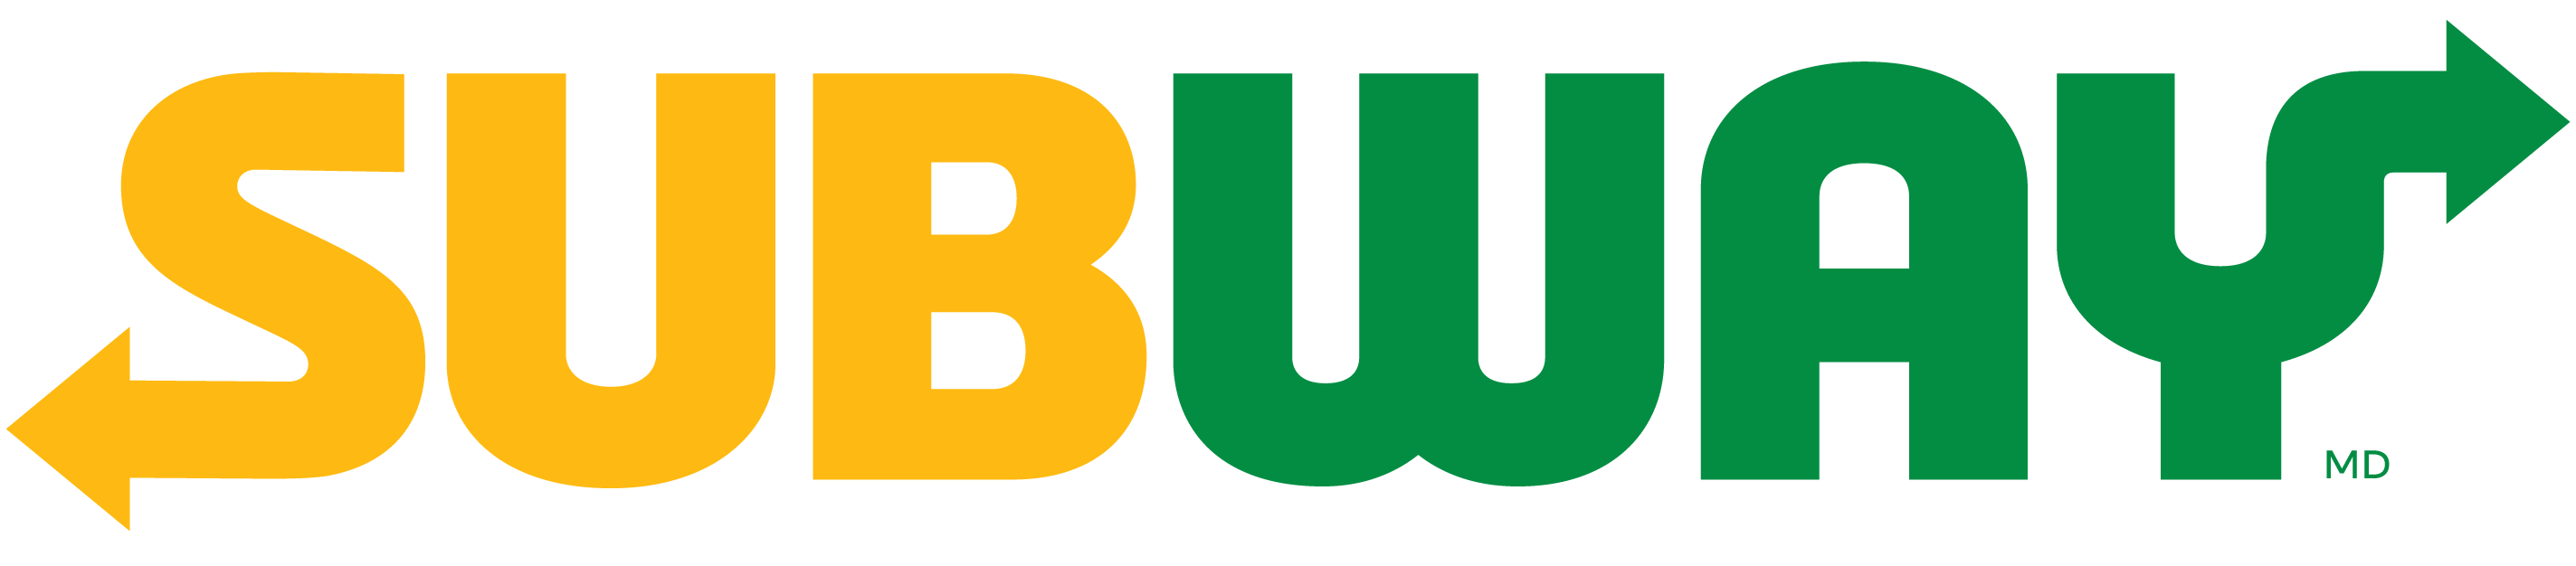 Logo - Subway